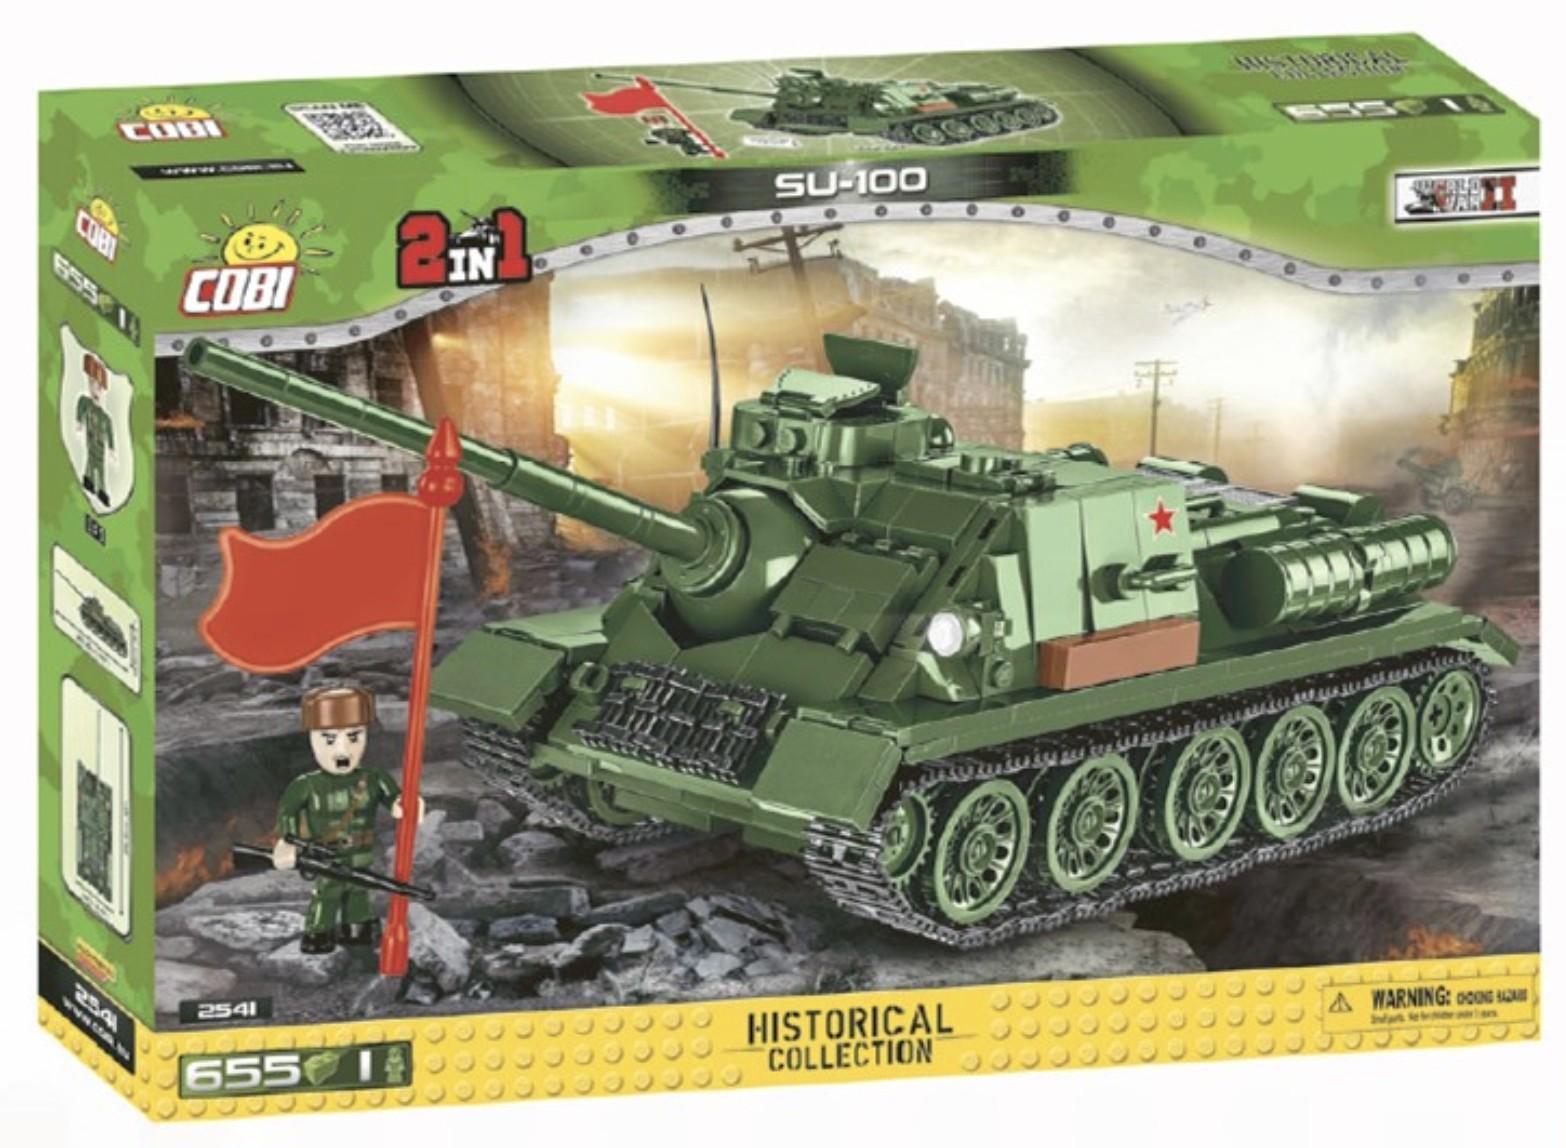 2541 - SU-100